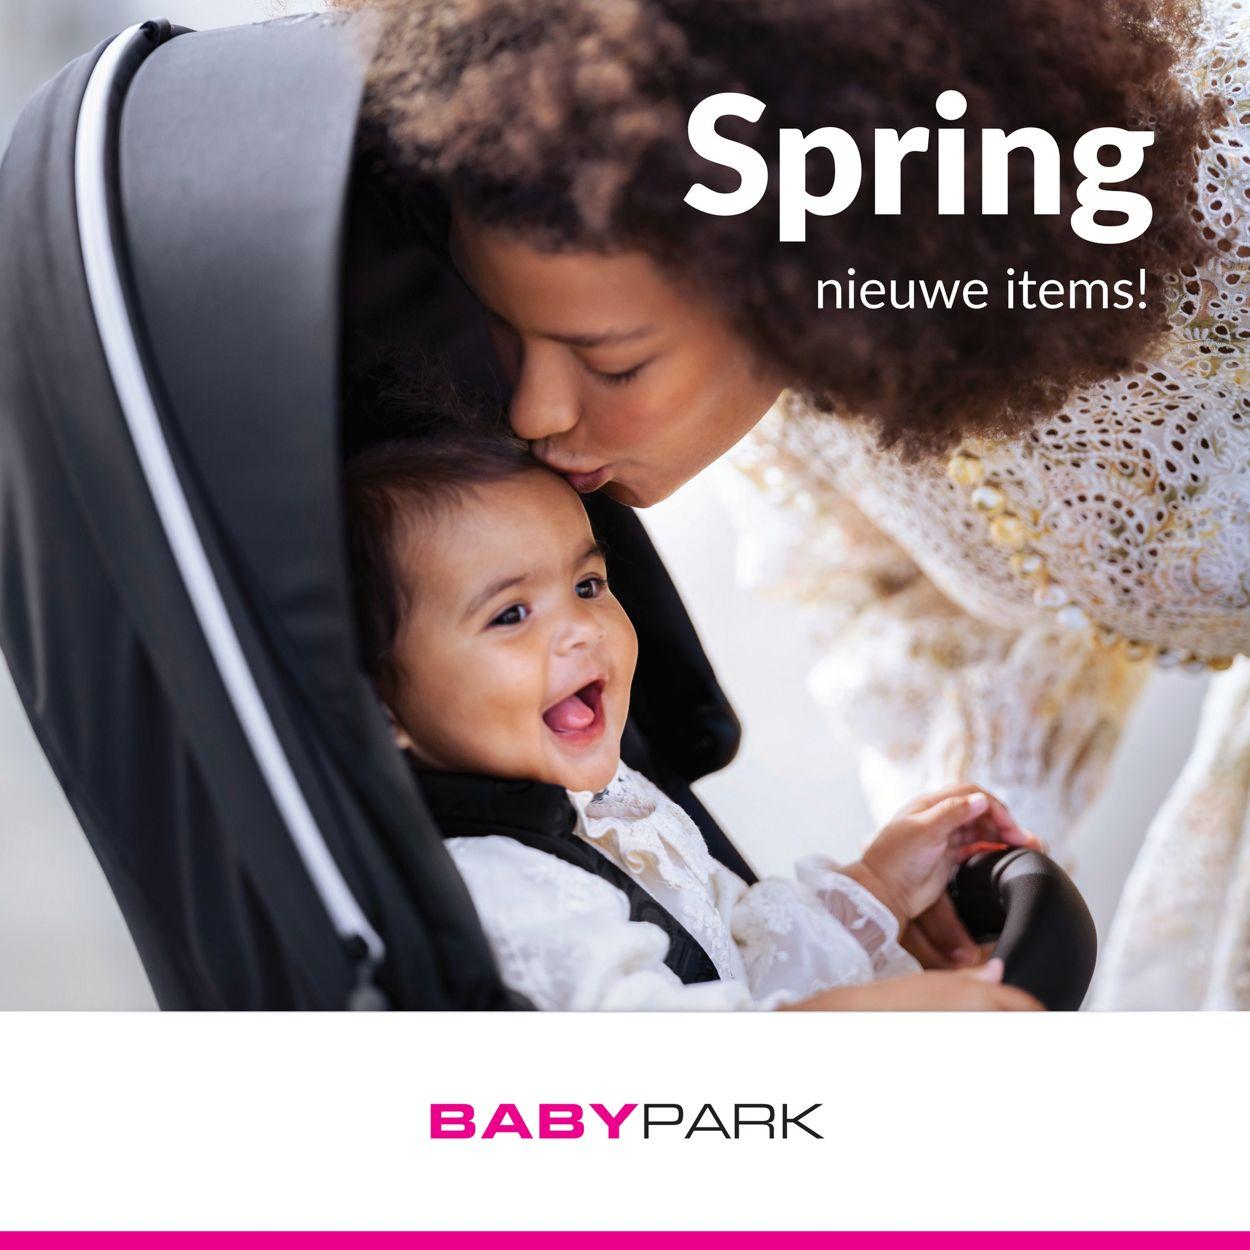 Catalogus van Babypark van 16.03.2021